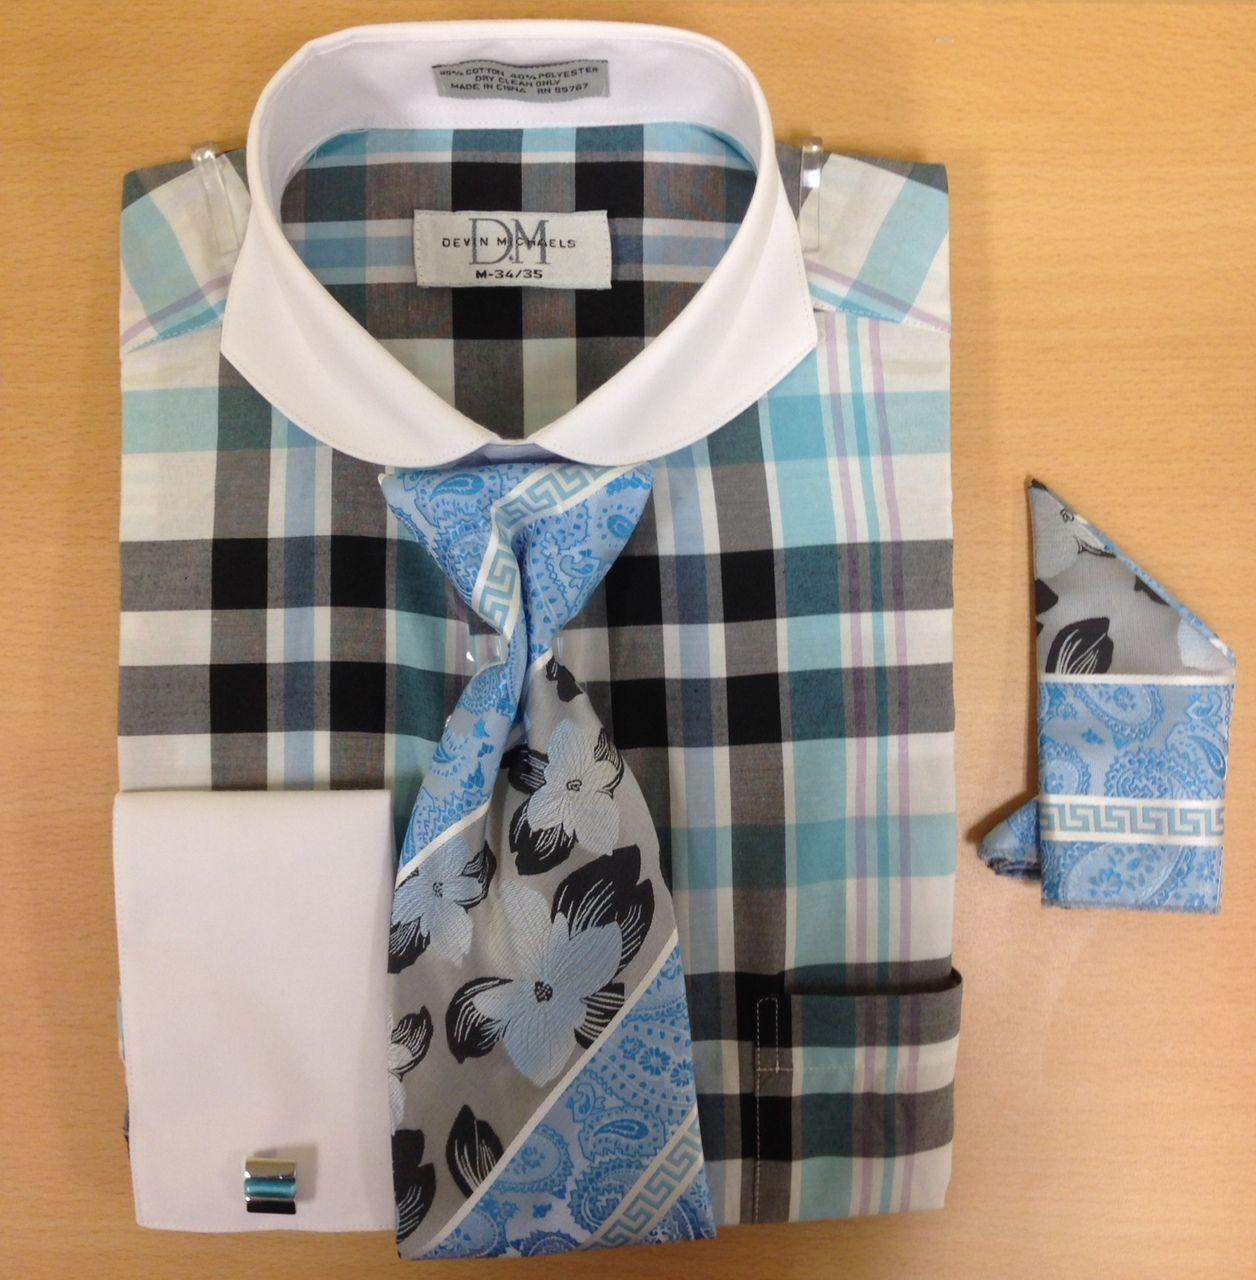 Men's Fashion Large/Small Checked Cufflink Dress Shirt Set - Turquoise/Black